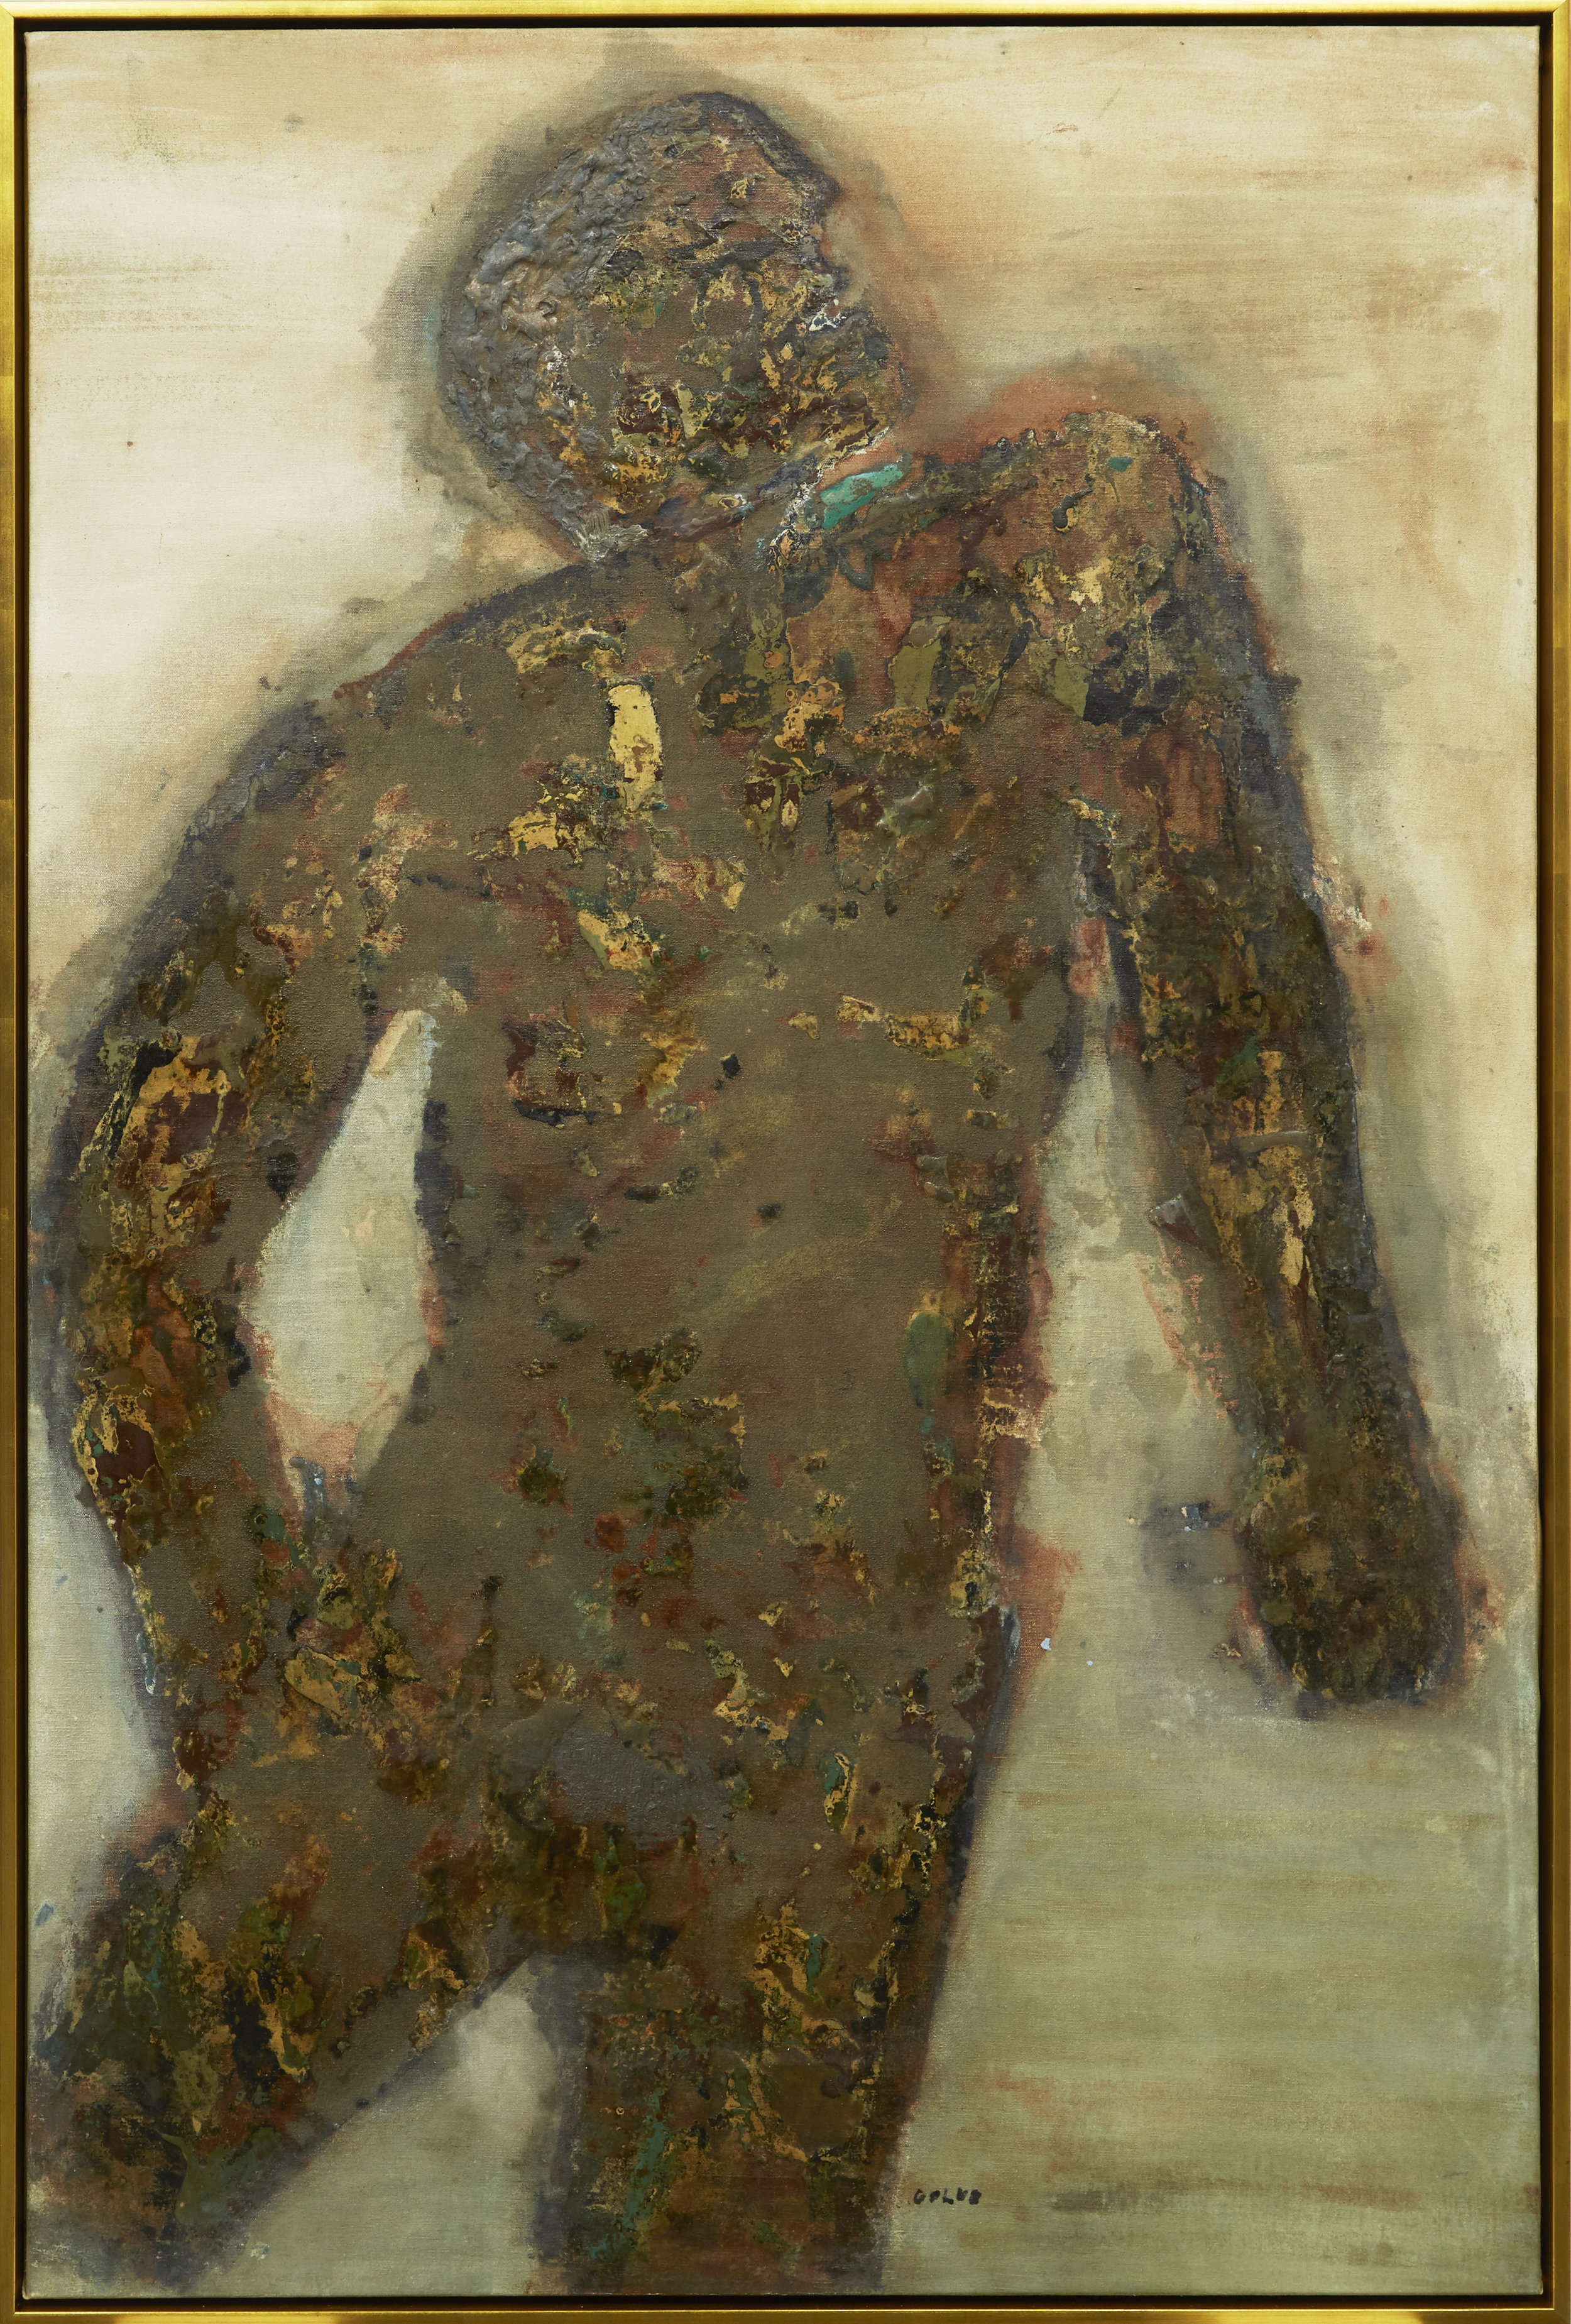 Burnt Man,  Leon Golub, after treatment at The Center.